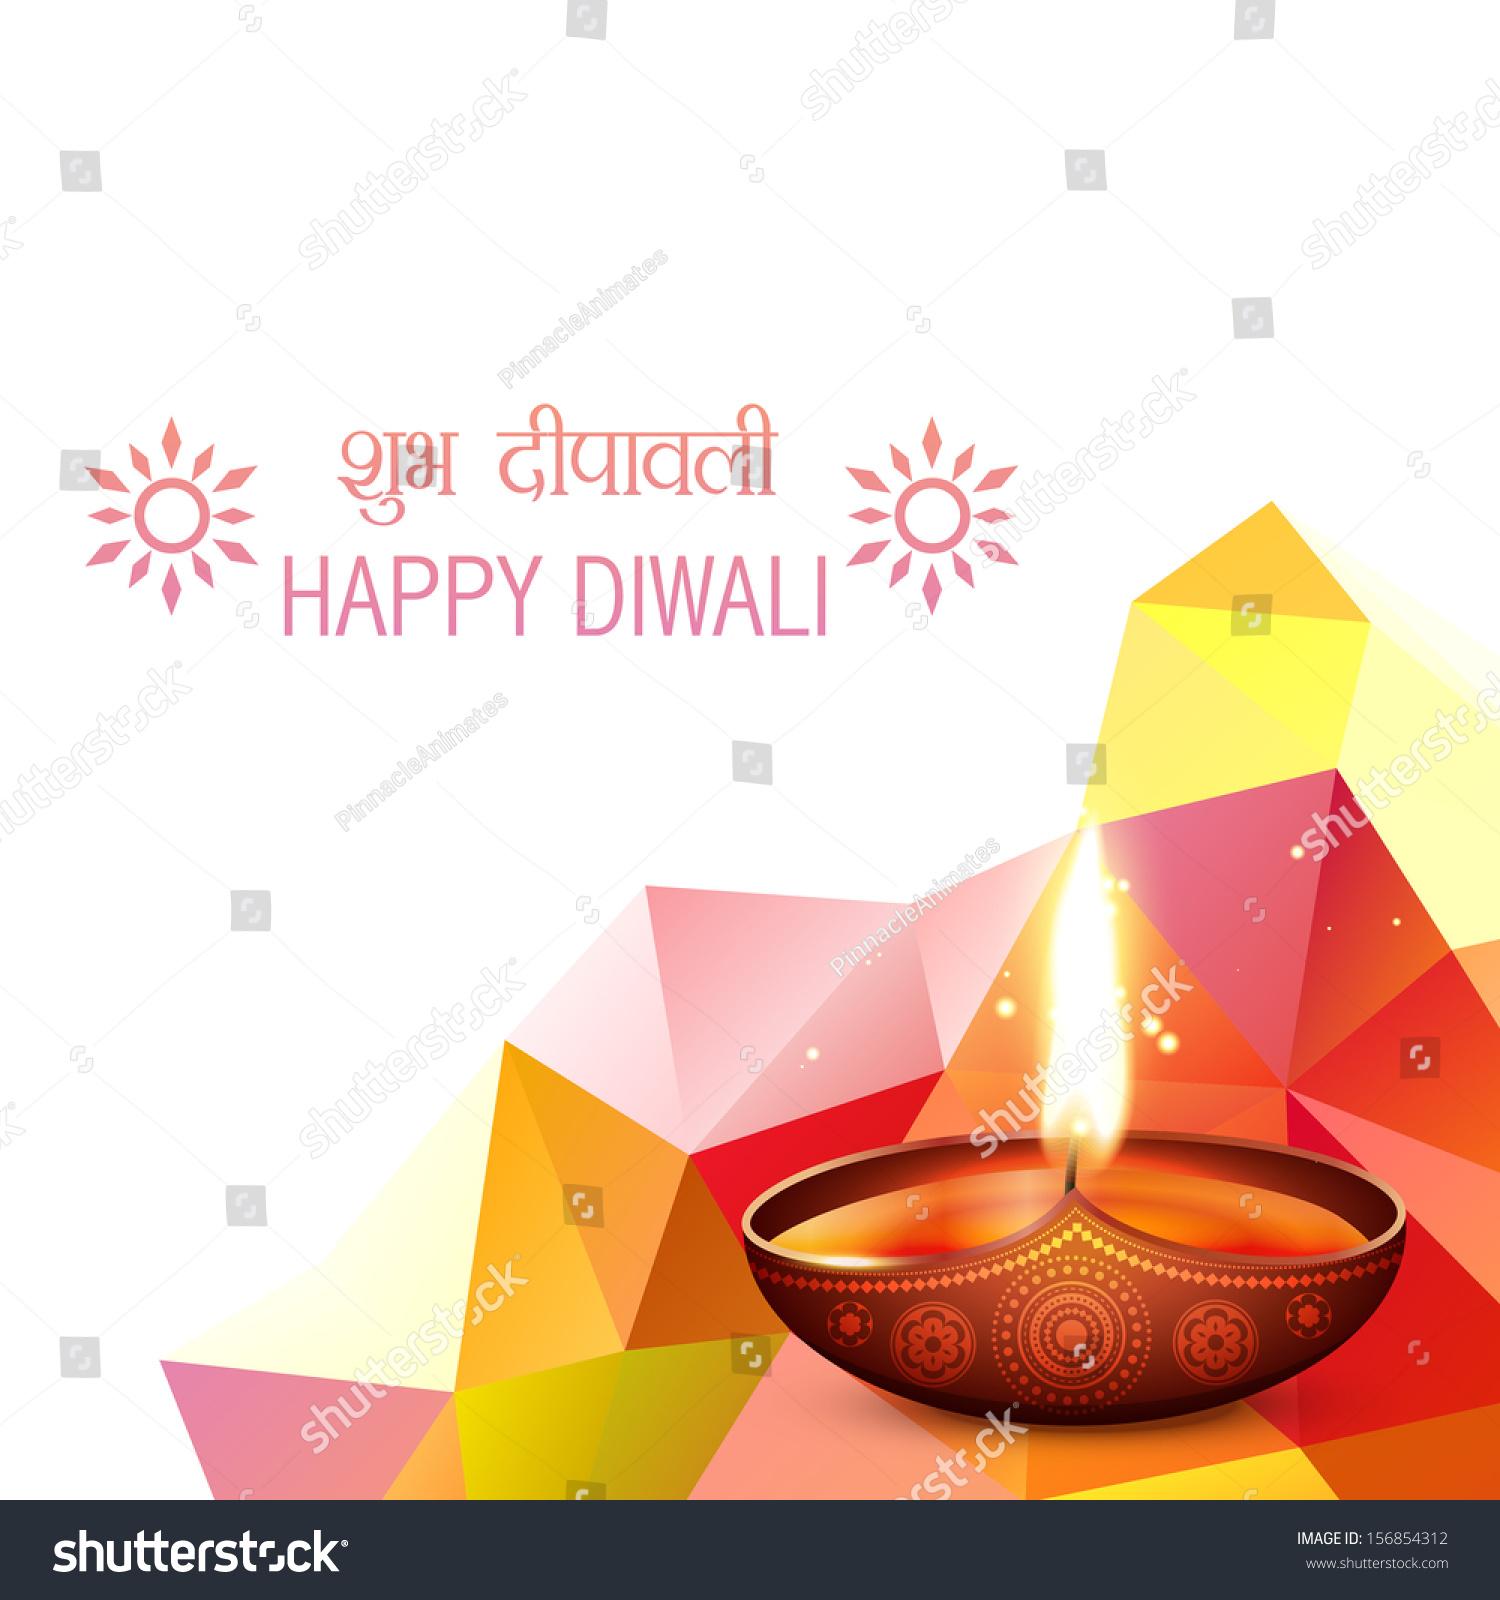 Happy diwali greeting design background stock vector royalty free happy diwali greeting design background m4hsunfo